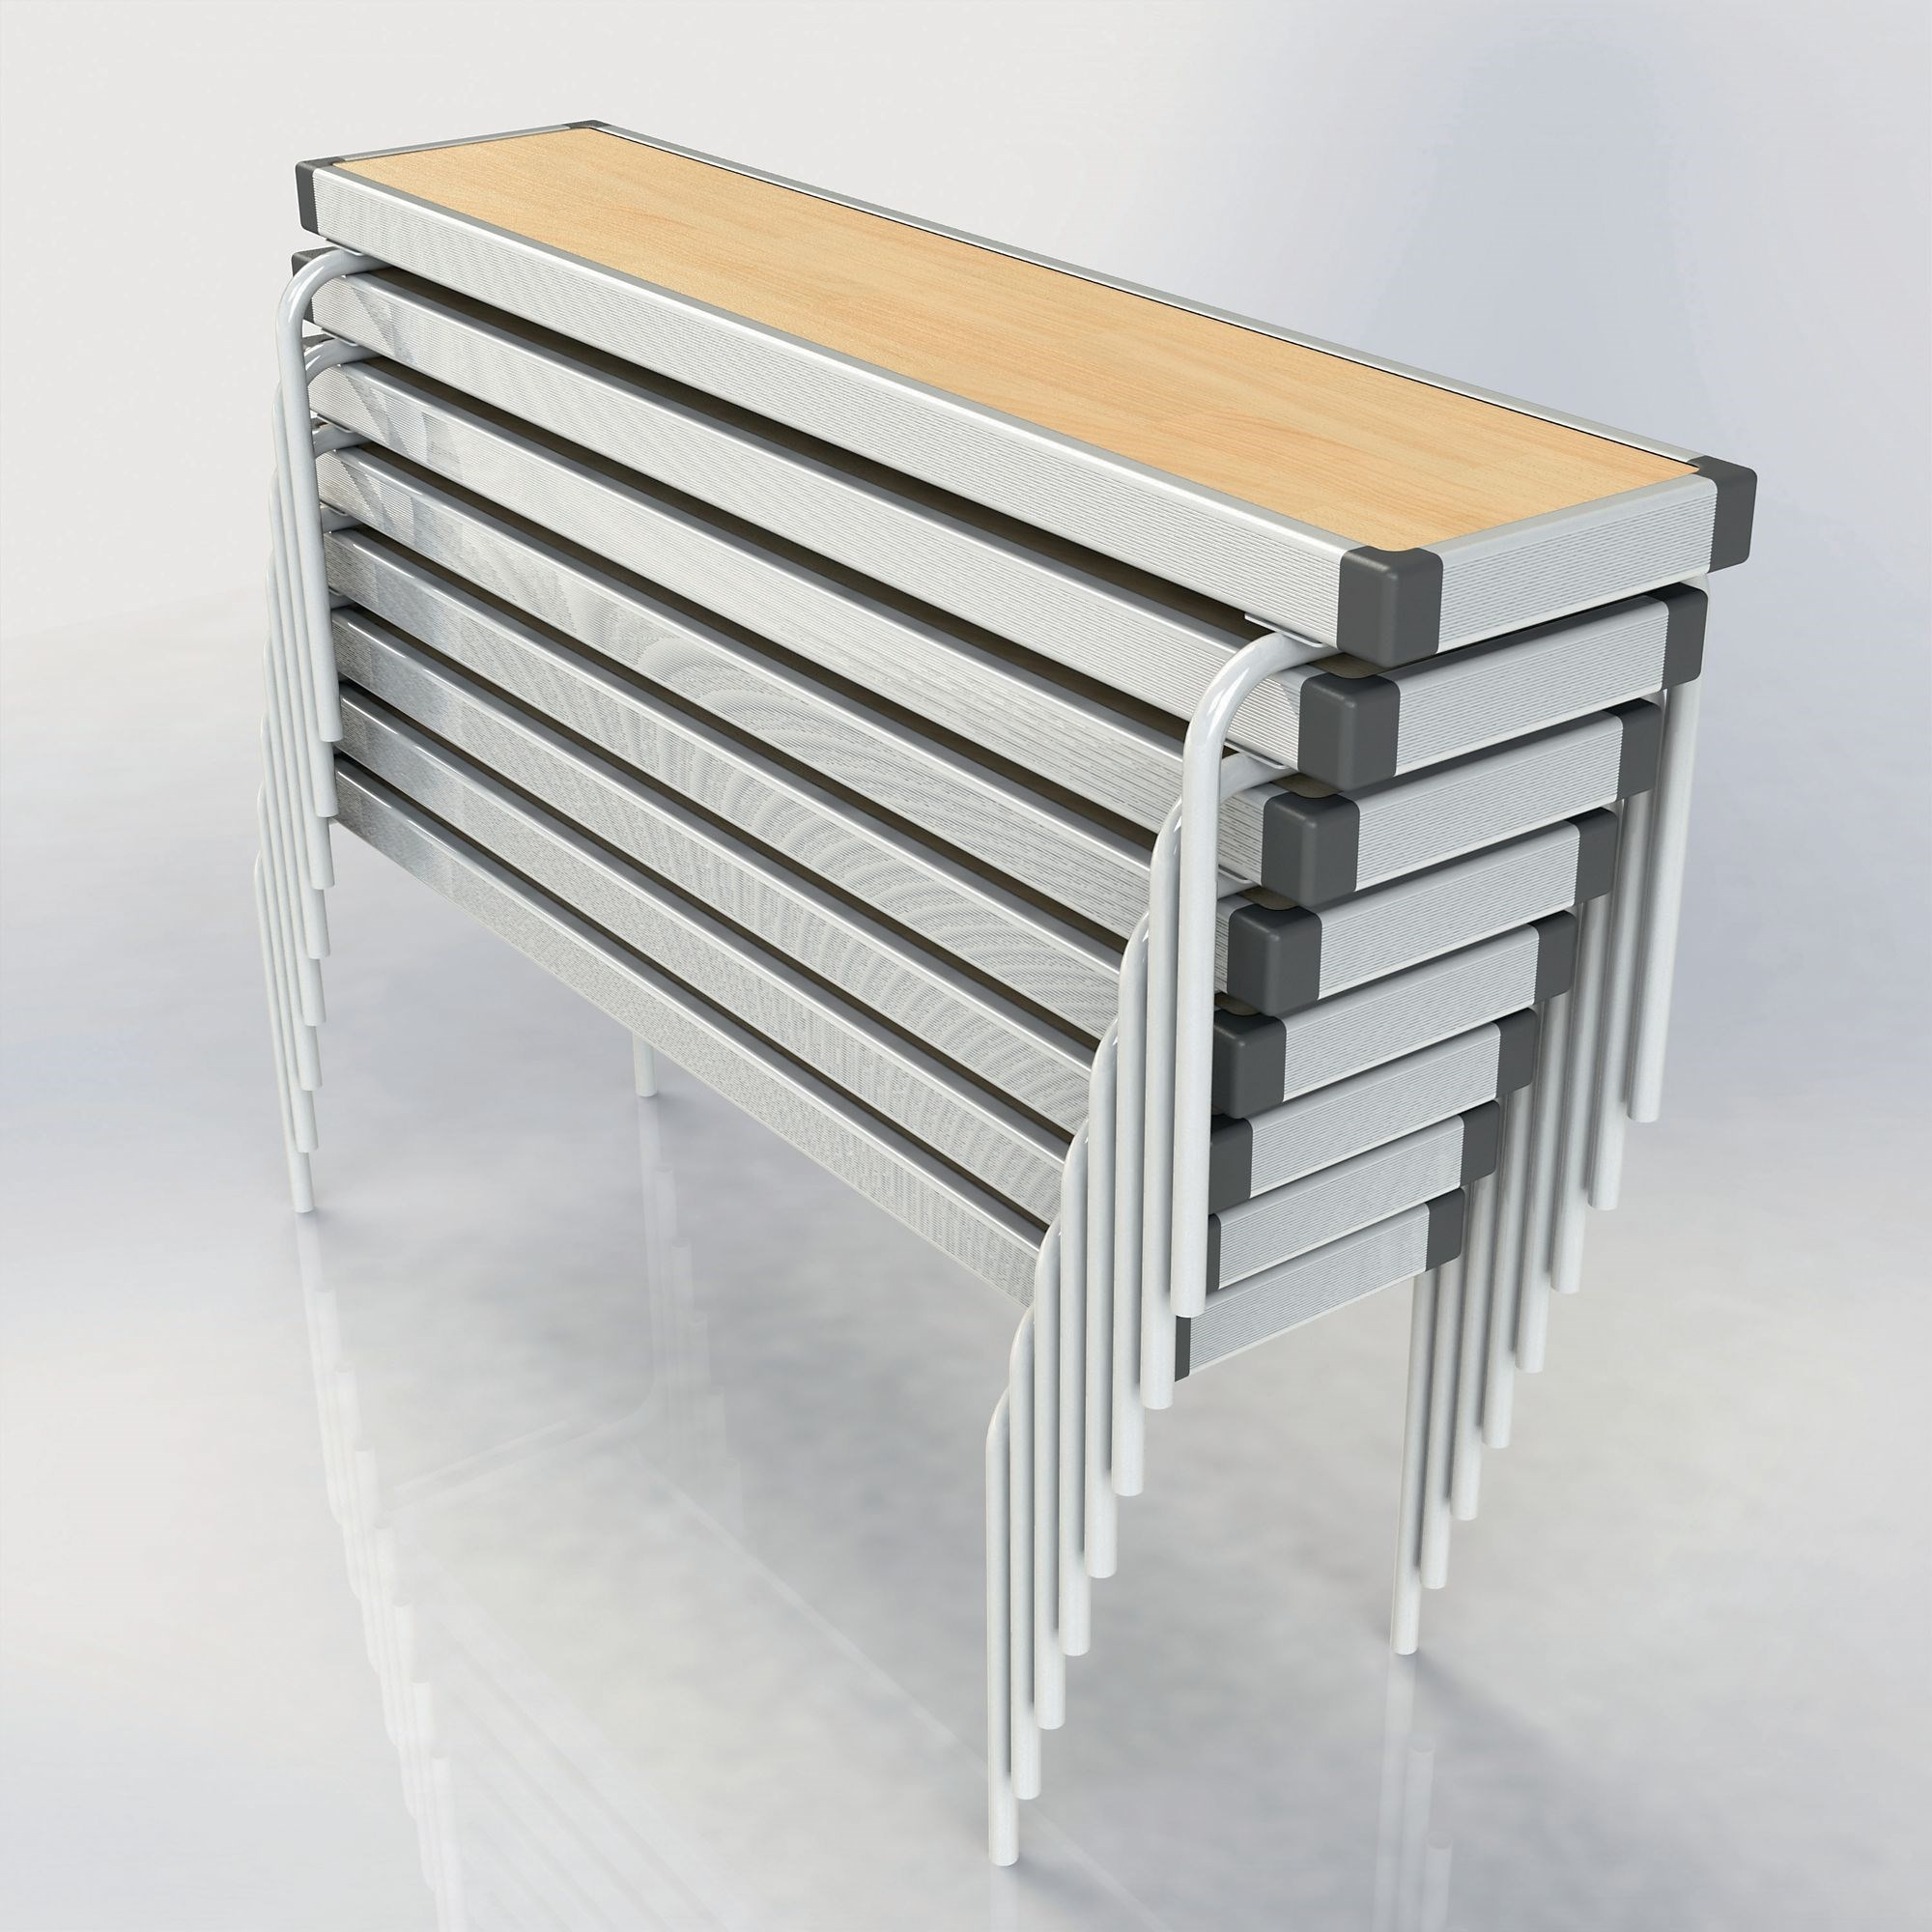 Rectangular Benches L1220 x H330 x W254mm Oak